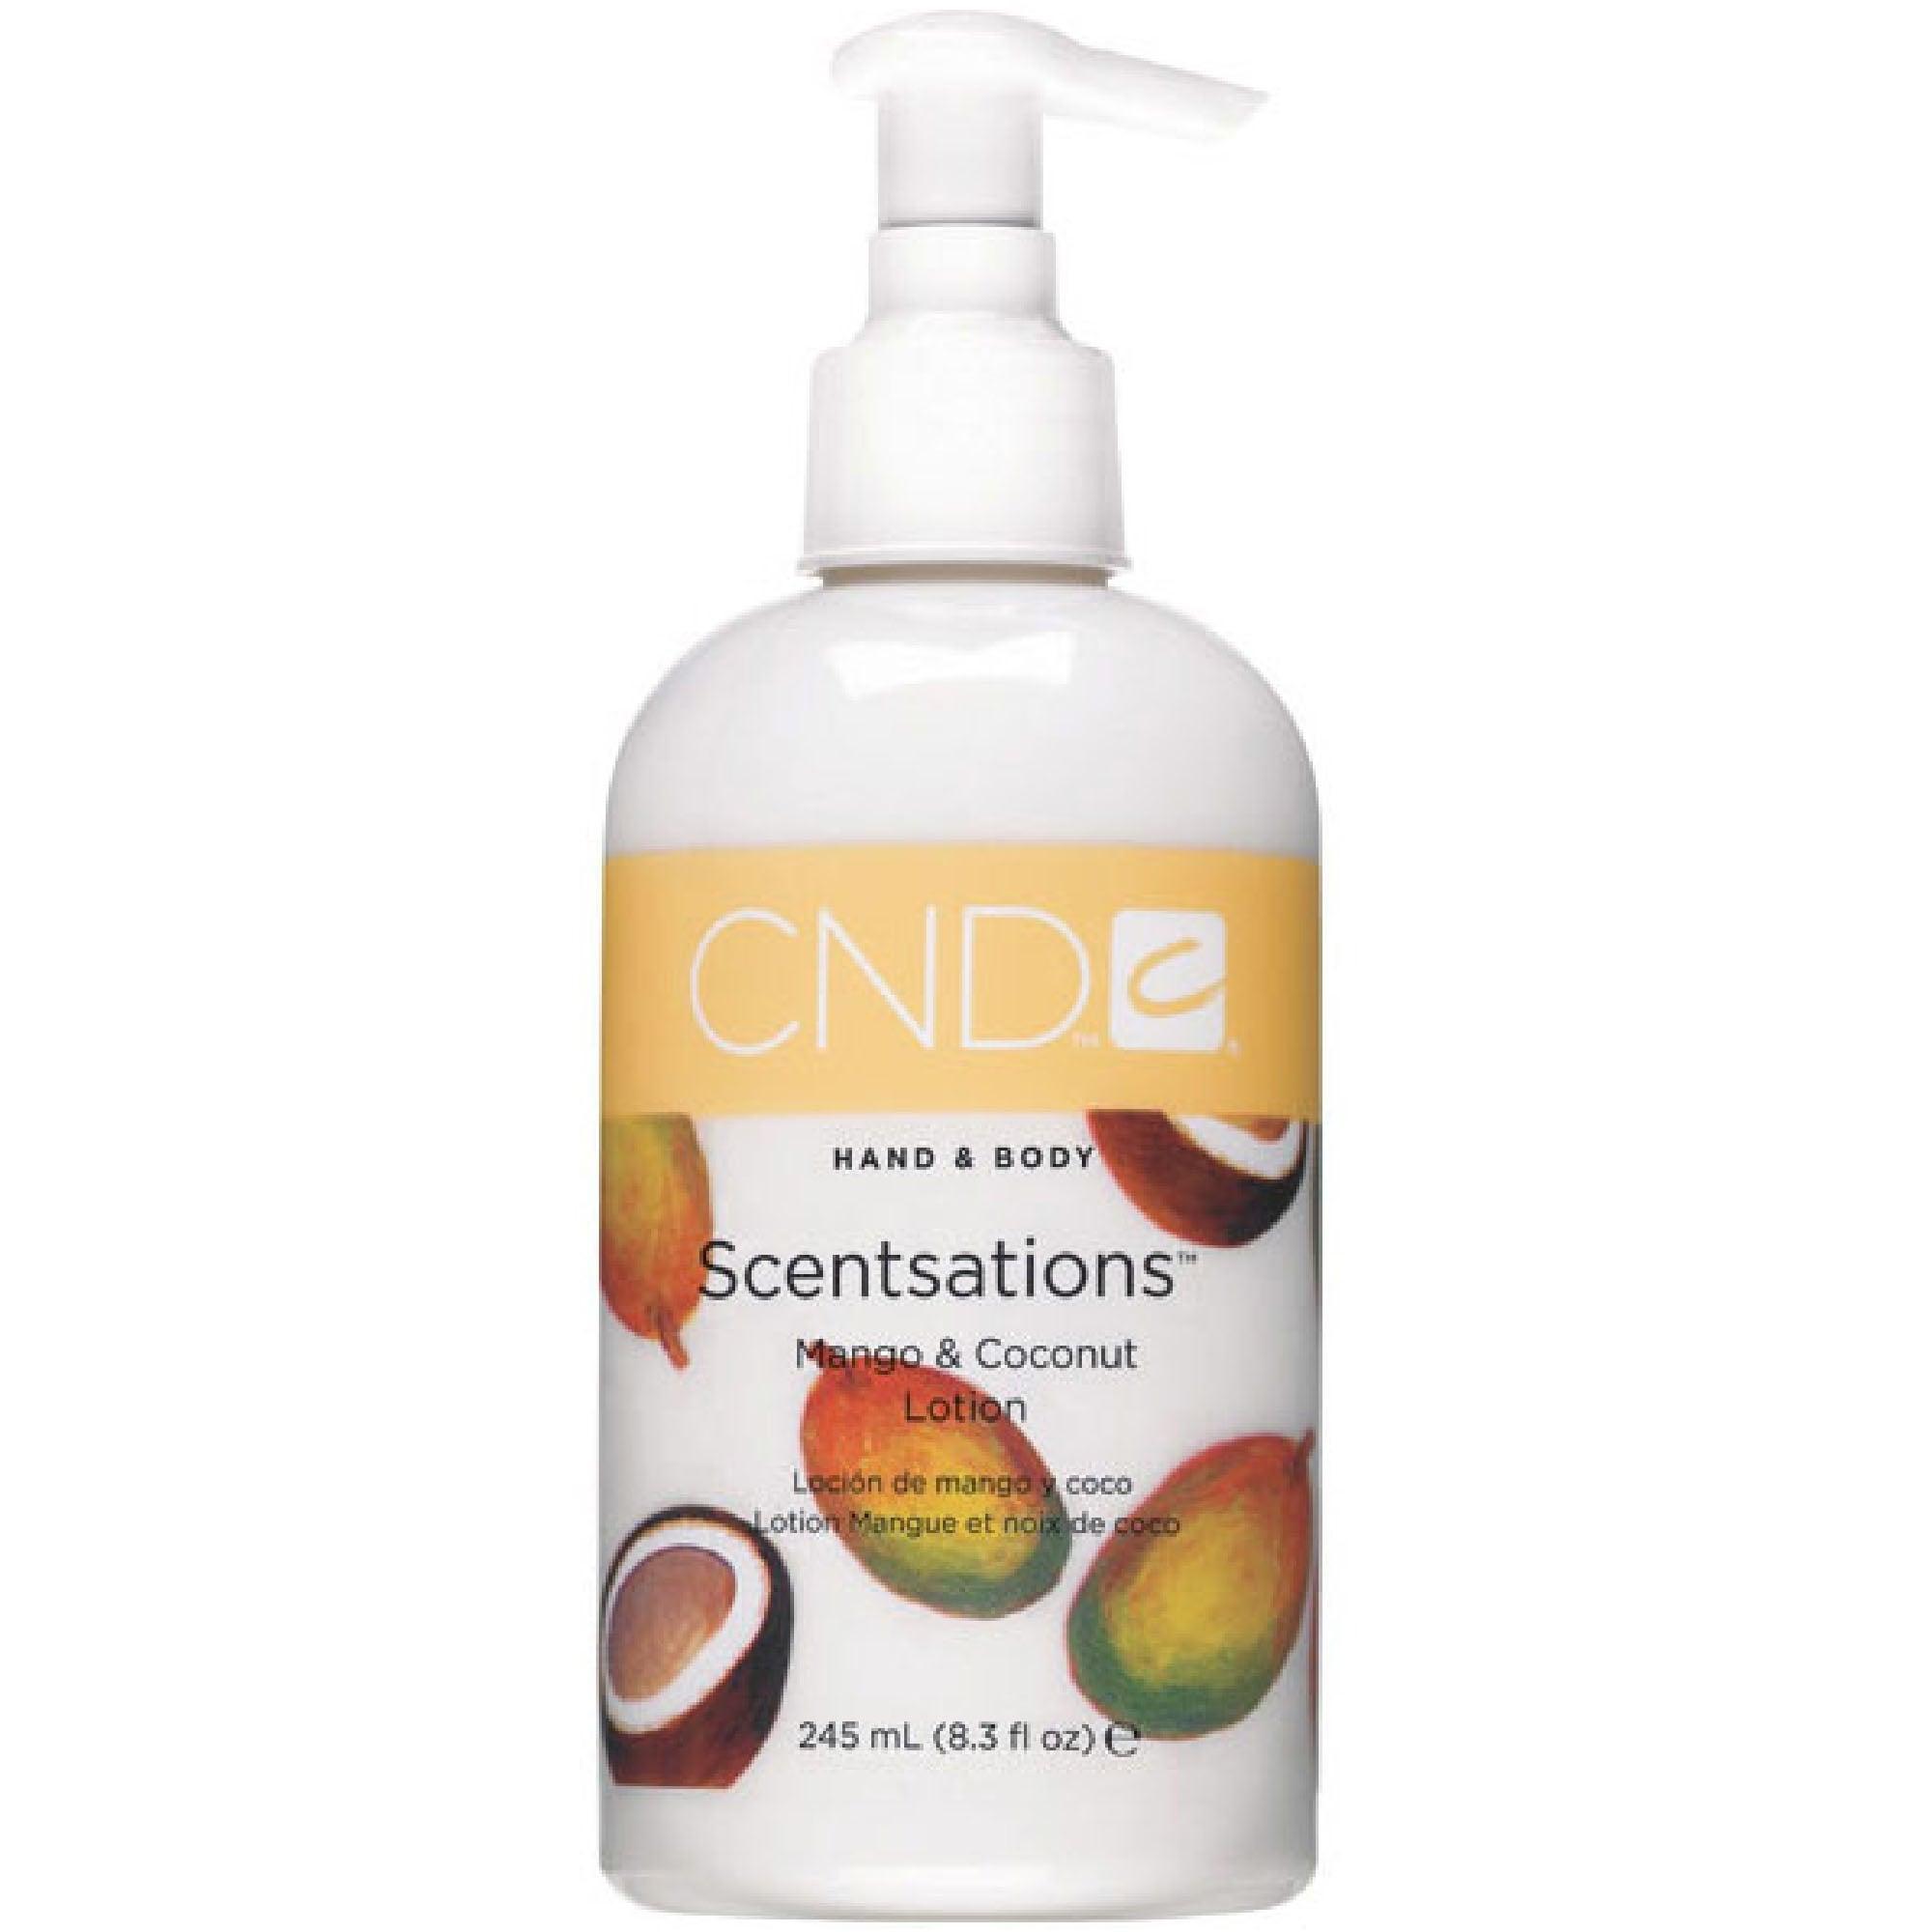 Afbeelding van CND ™ Scentsations Lotion - Mango & Coconut 245 ml